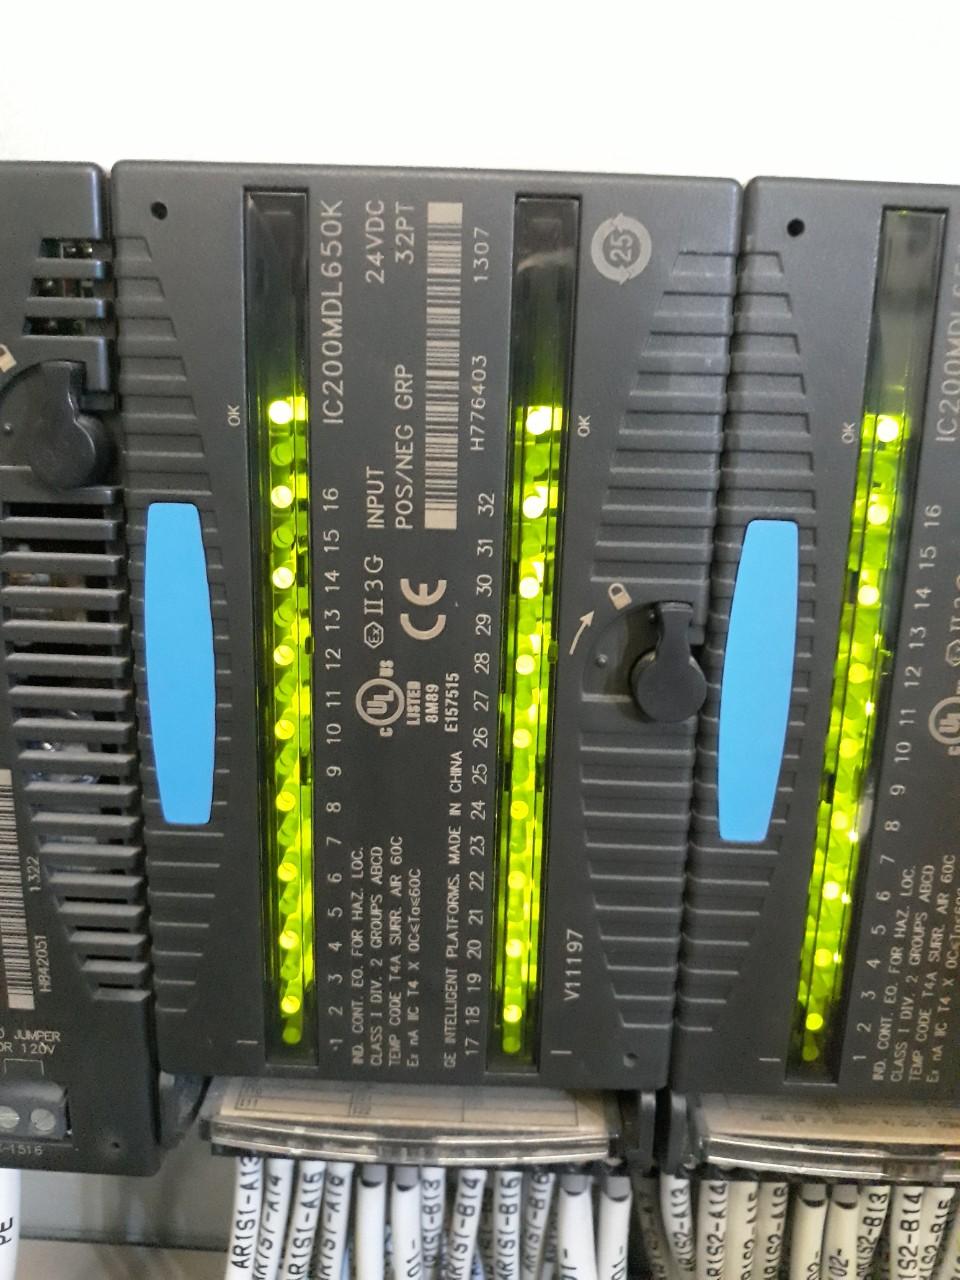 Cung cấp Input Modules 24VDC hãng GE-FANUC